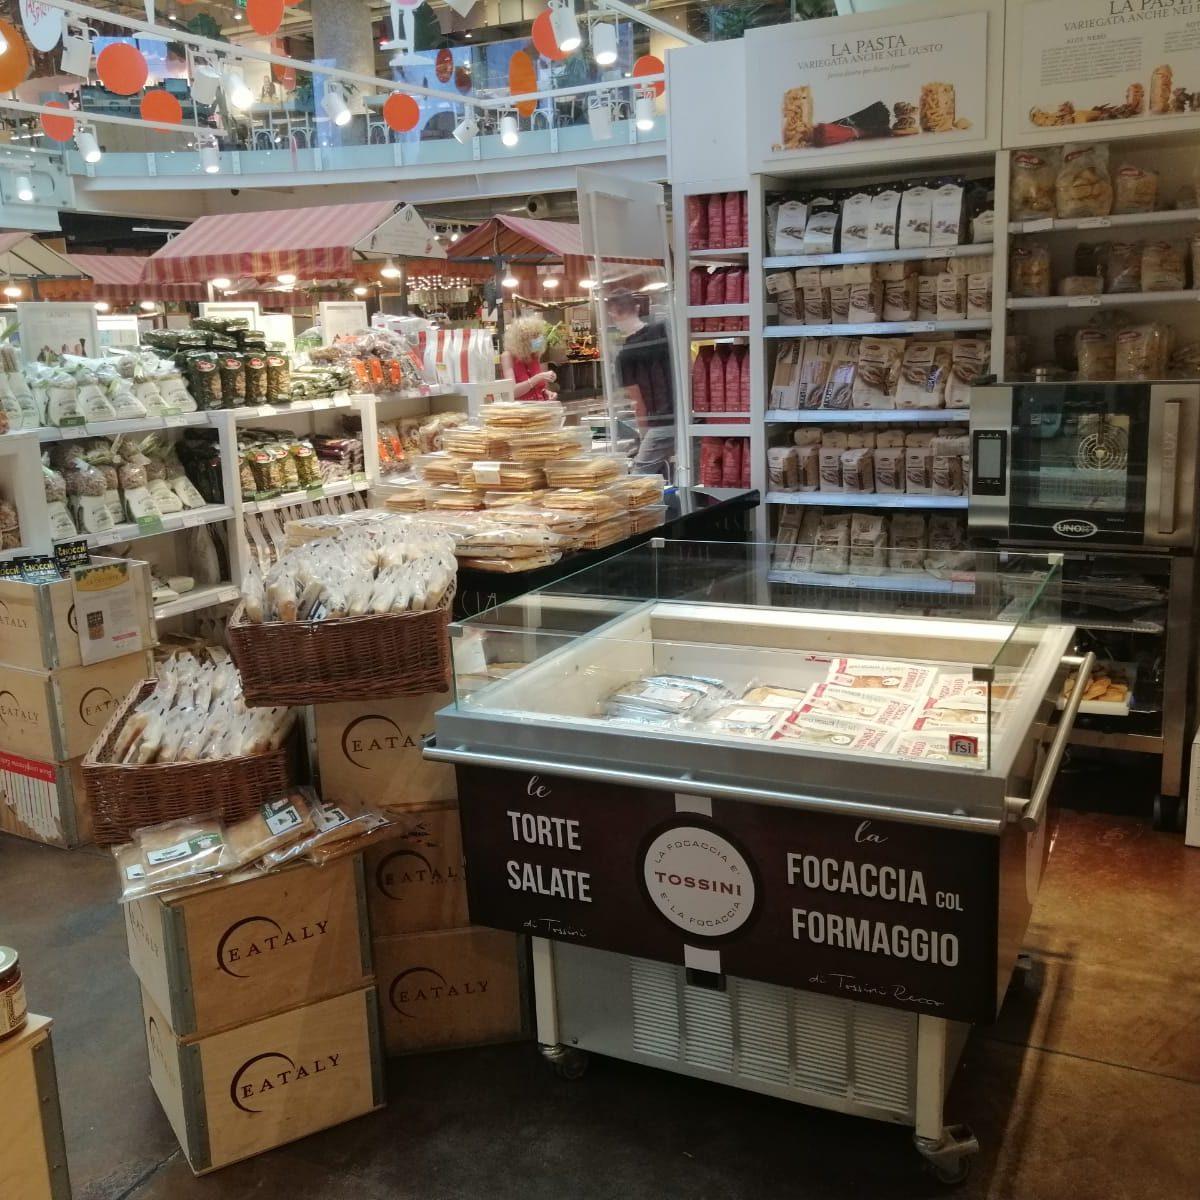 Corner Tossini -Eataly Store Milano Smeraldo (15)